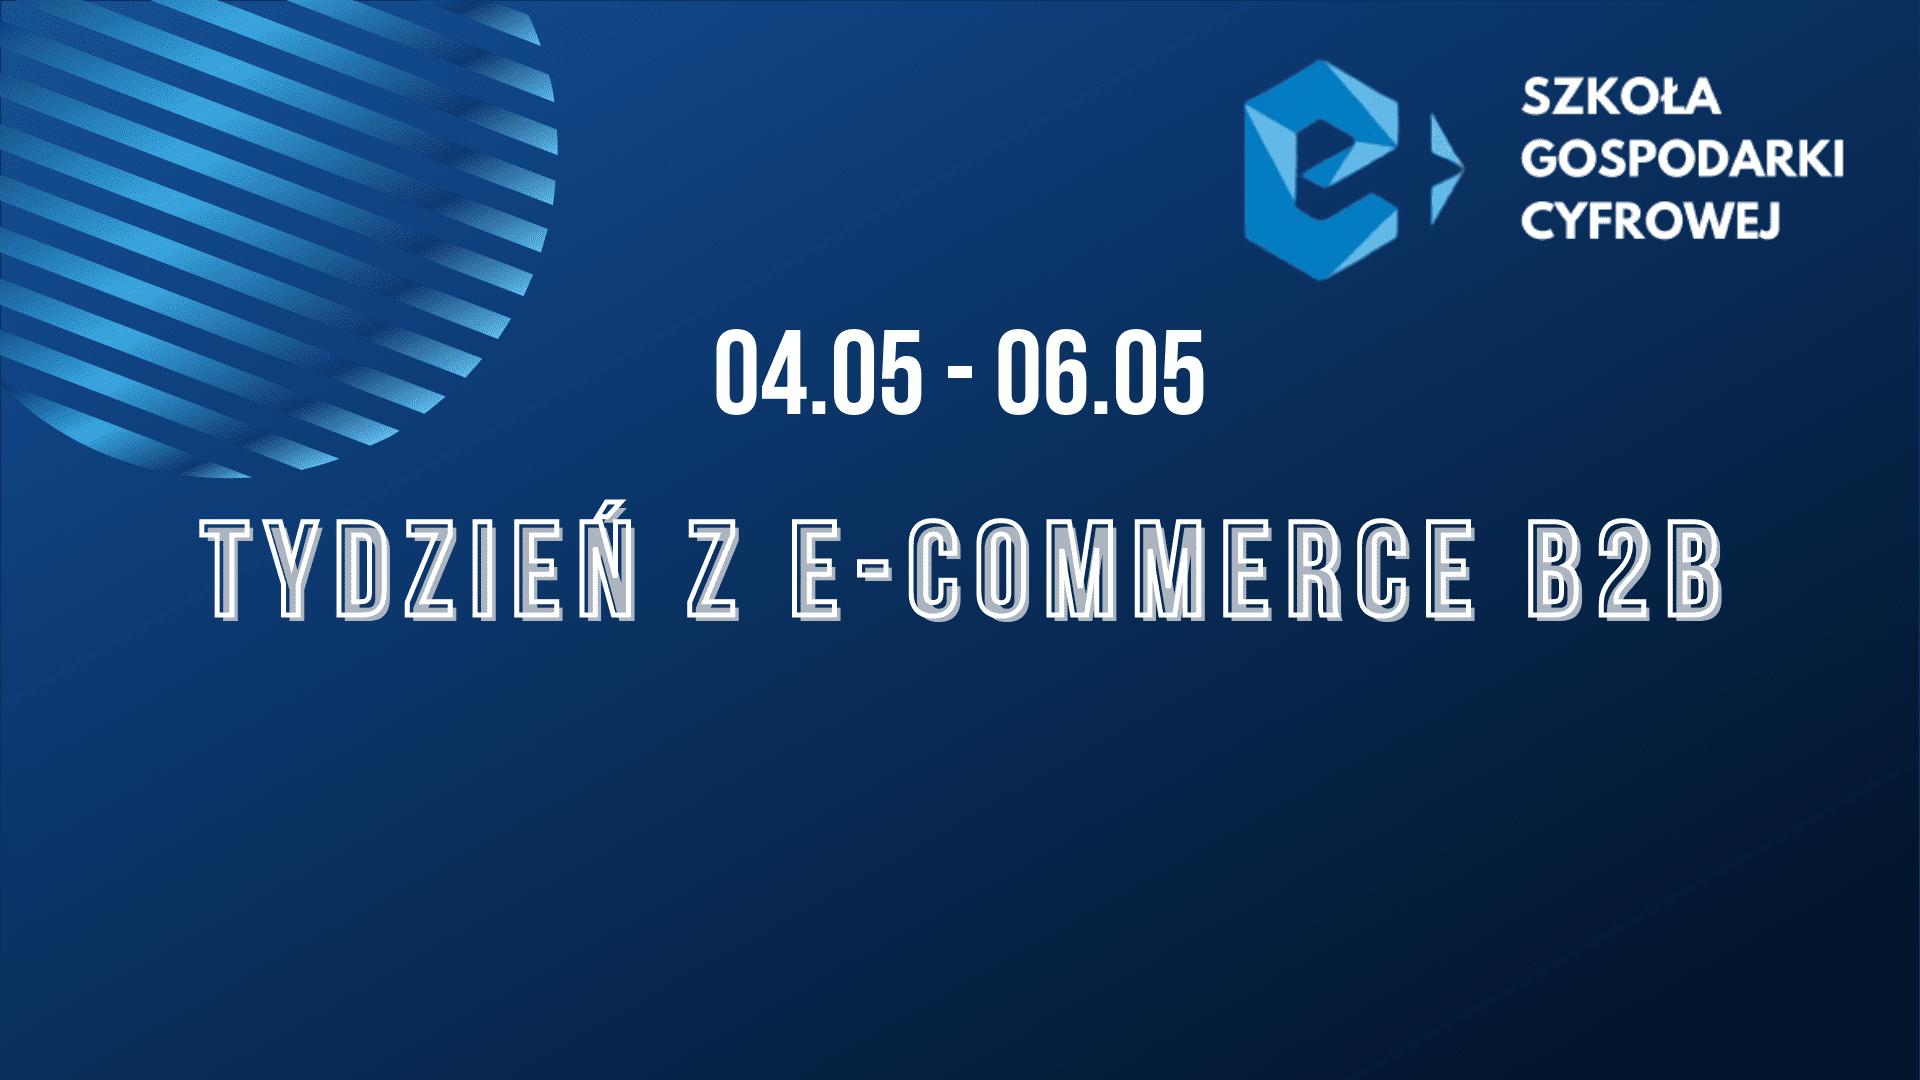 Startuje Tydzień z e-commerce B2B!